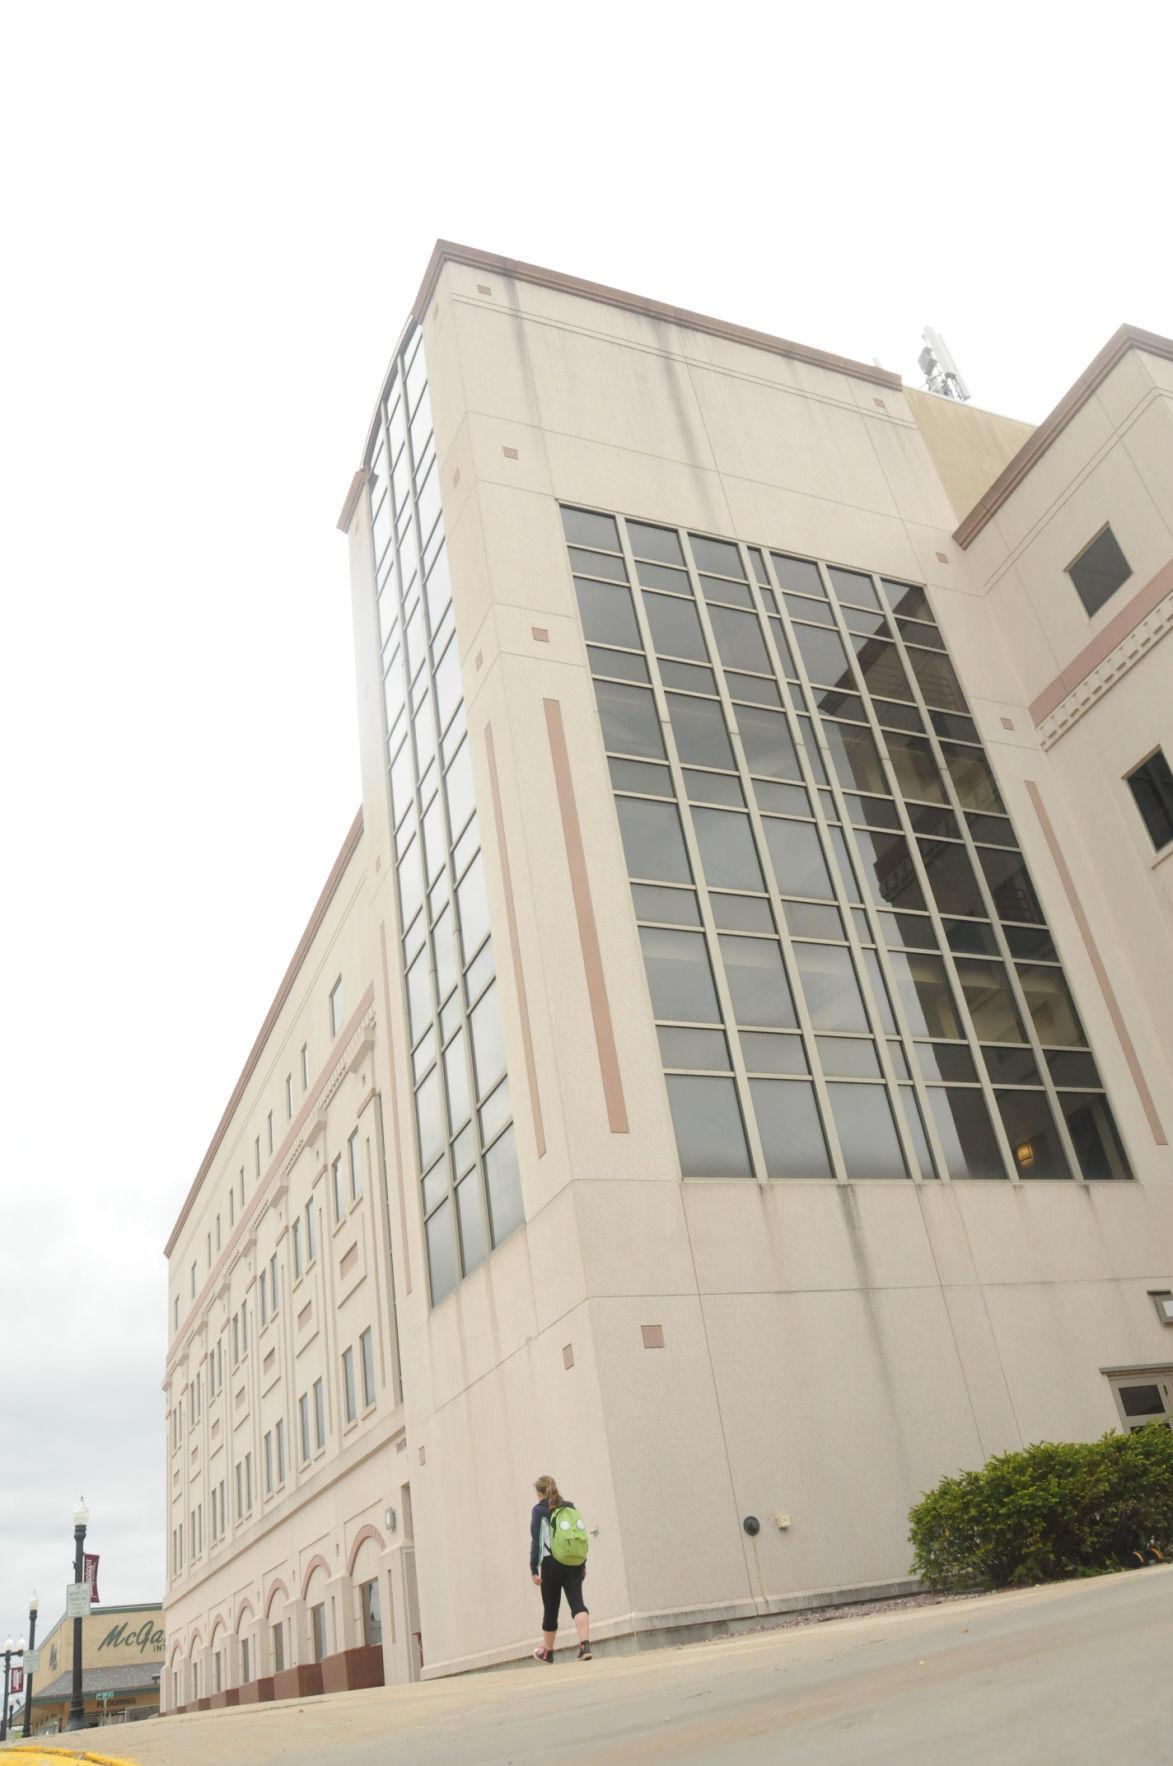 Sauk County West Square Building